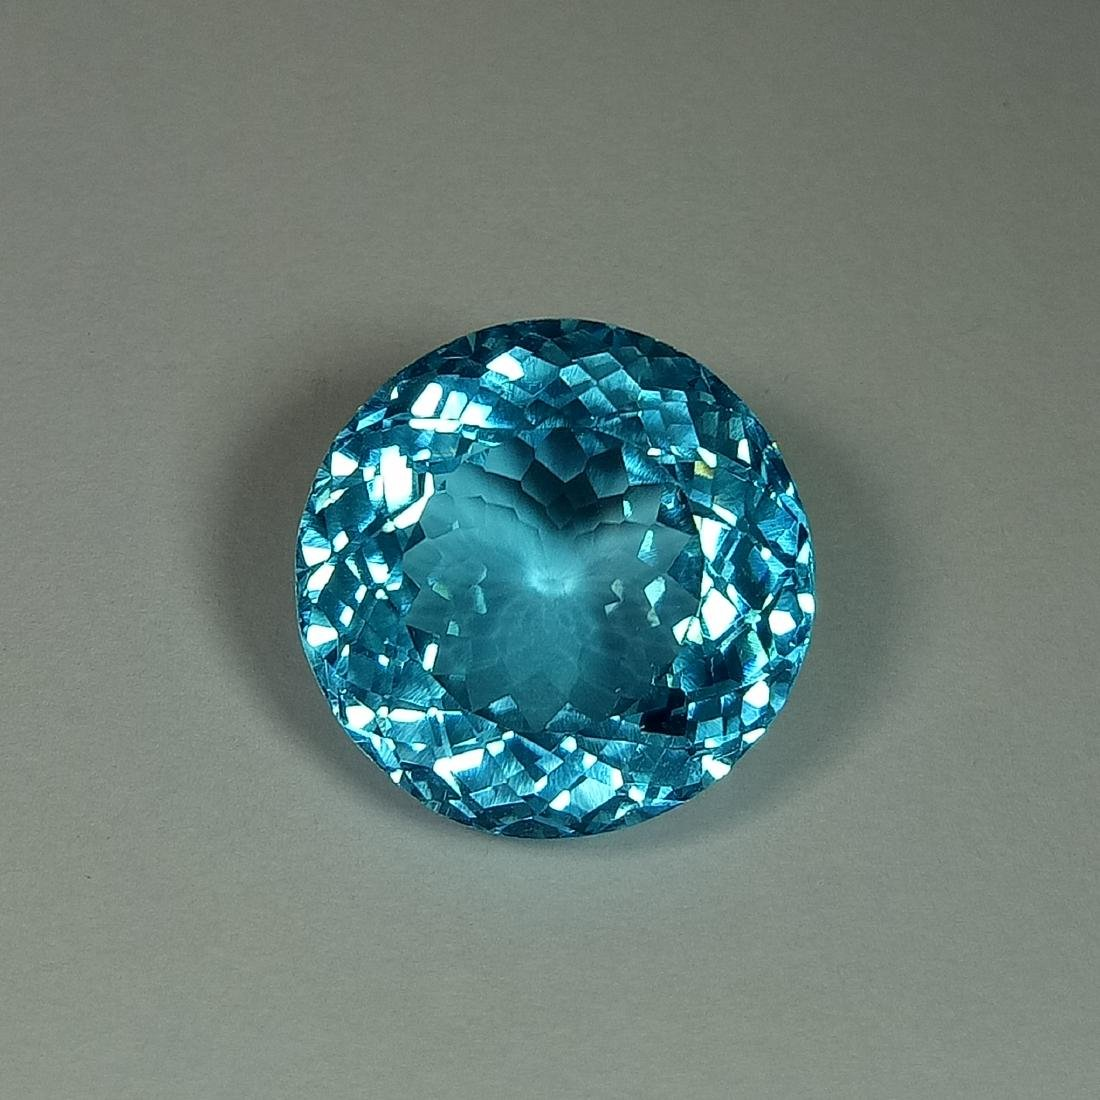 Swiss Blue Topaz - 35.30 ct